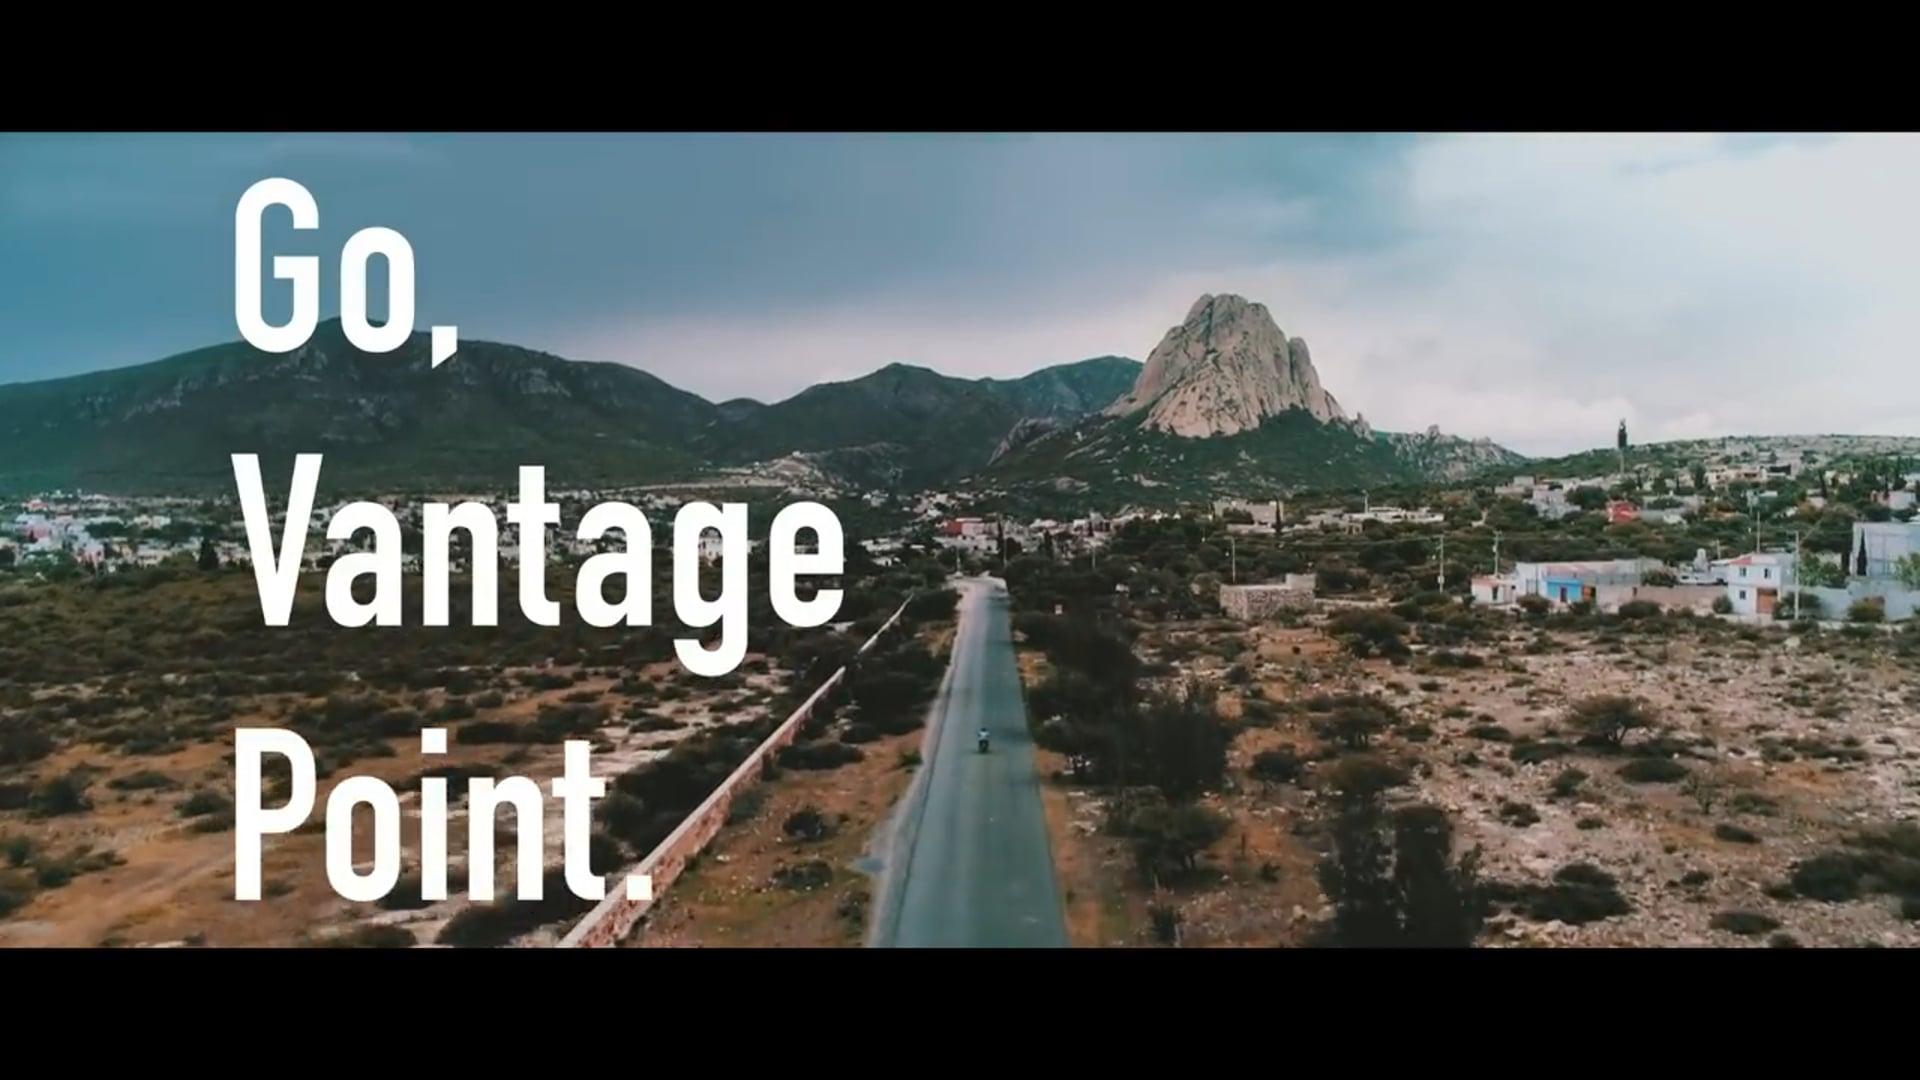 ONE OK ROCK×Honda Bike 「Go, Vantage Point.」 60秒 Honda CM